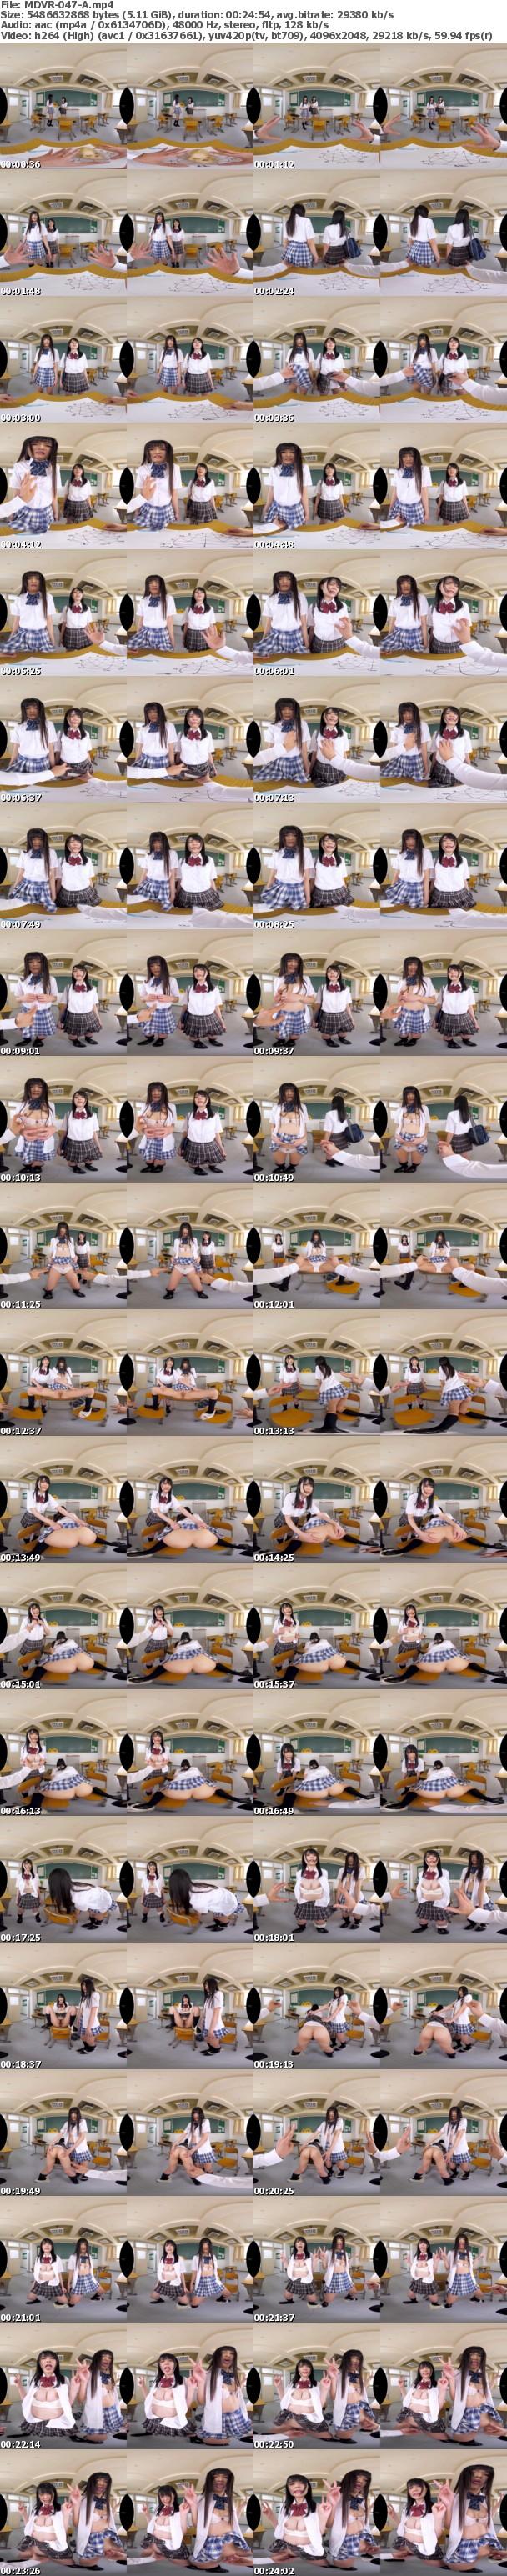 (VR) MDVR-047 エスパーになってクラスの女子を思いのままに操れるVR 神咲詩織 山井すず 藤波さとり